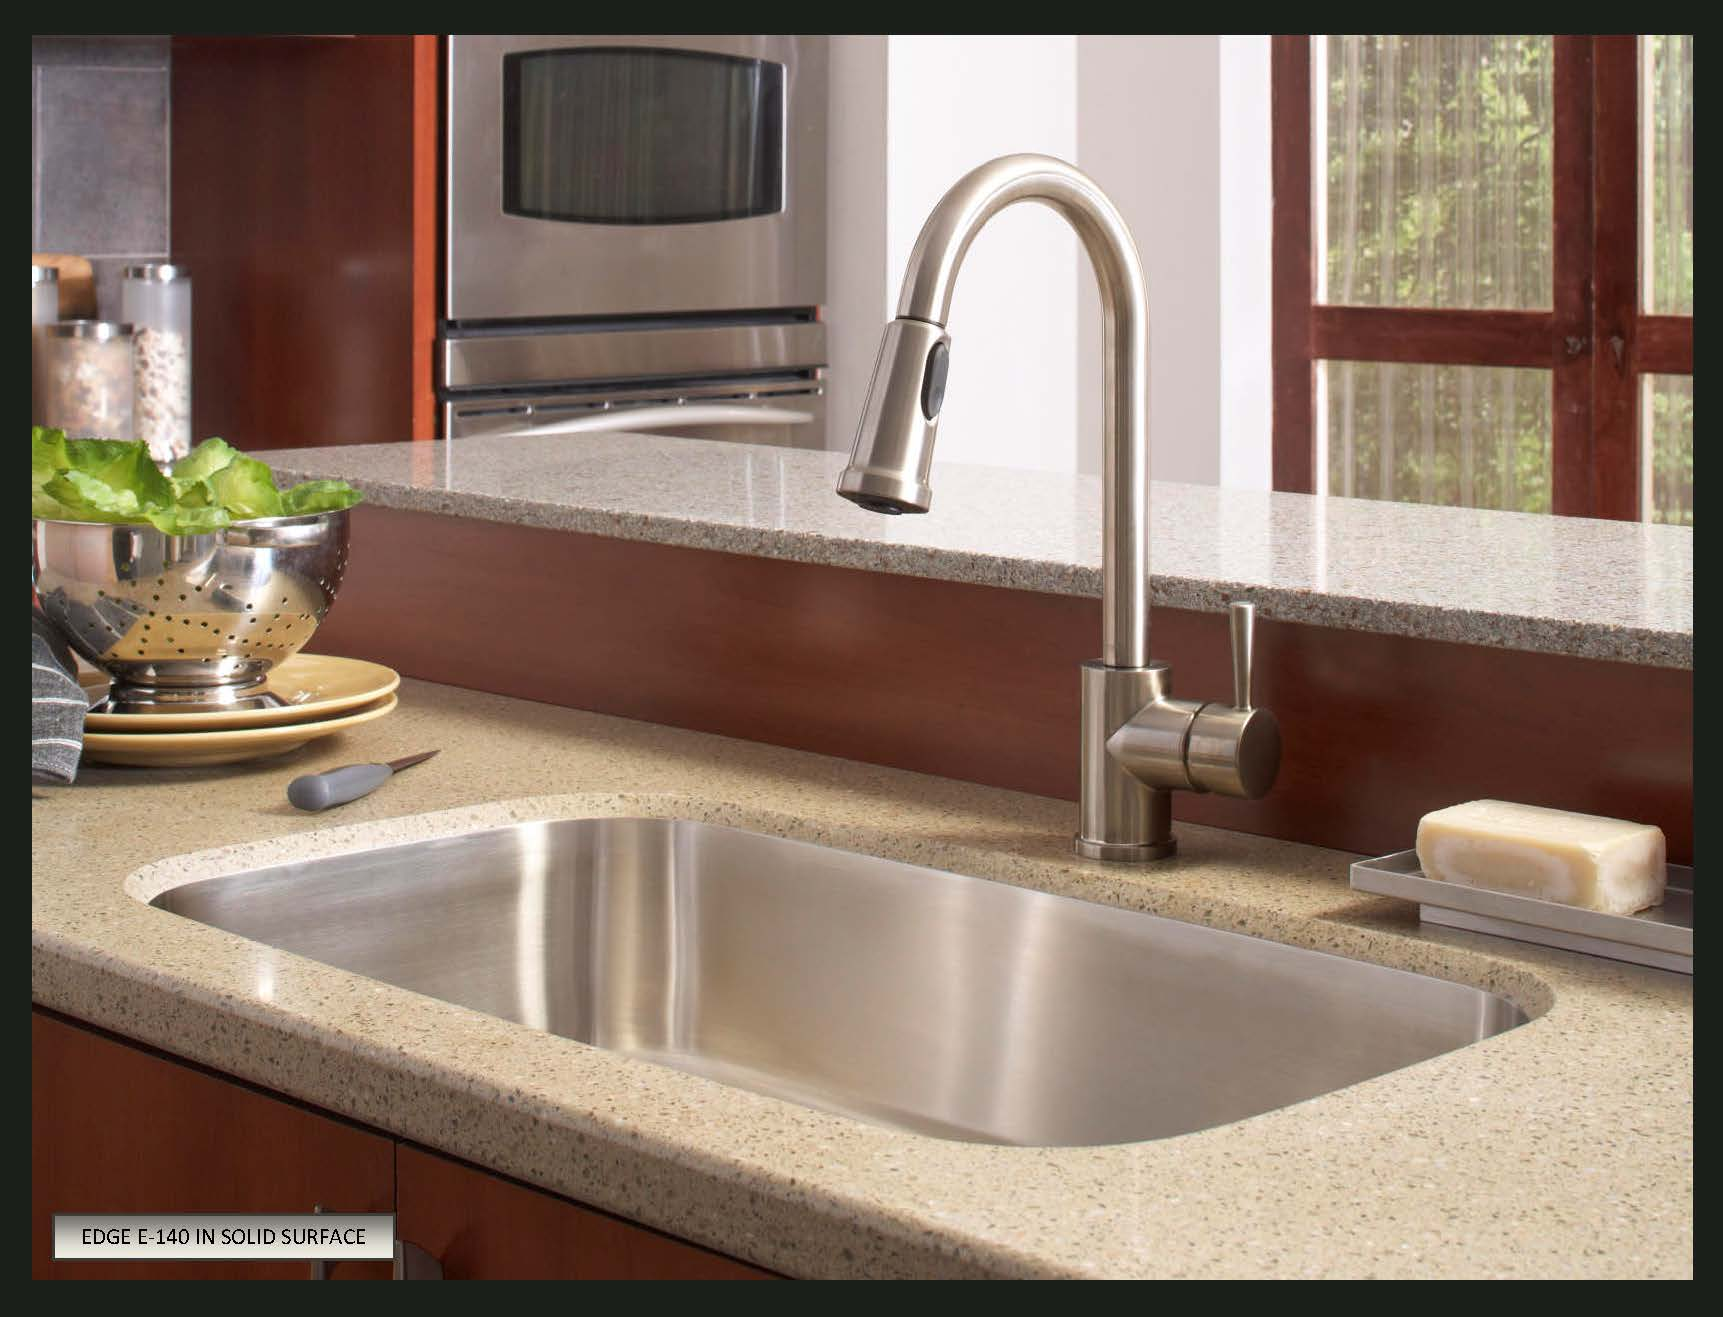 choose sink solid surface countertops undermount kitchen sinks Karran Undermount Stainless Steel Sinks